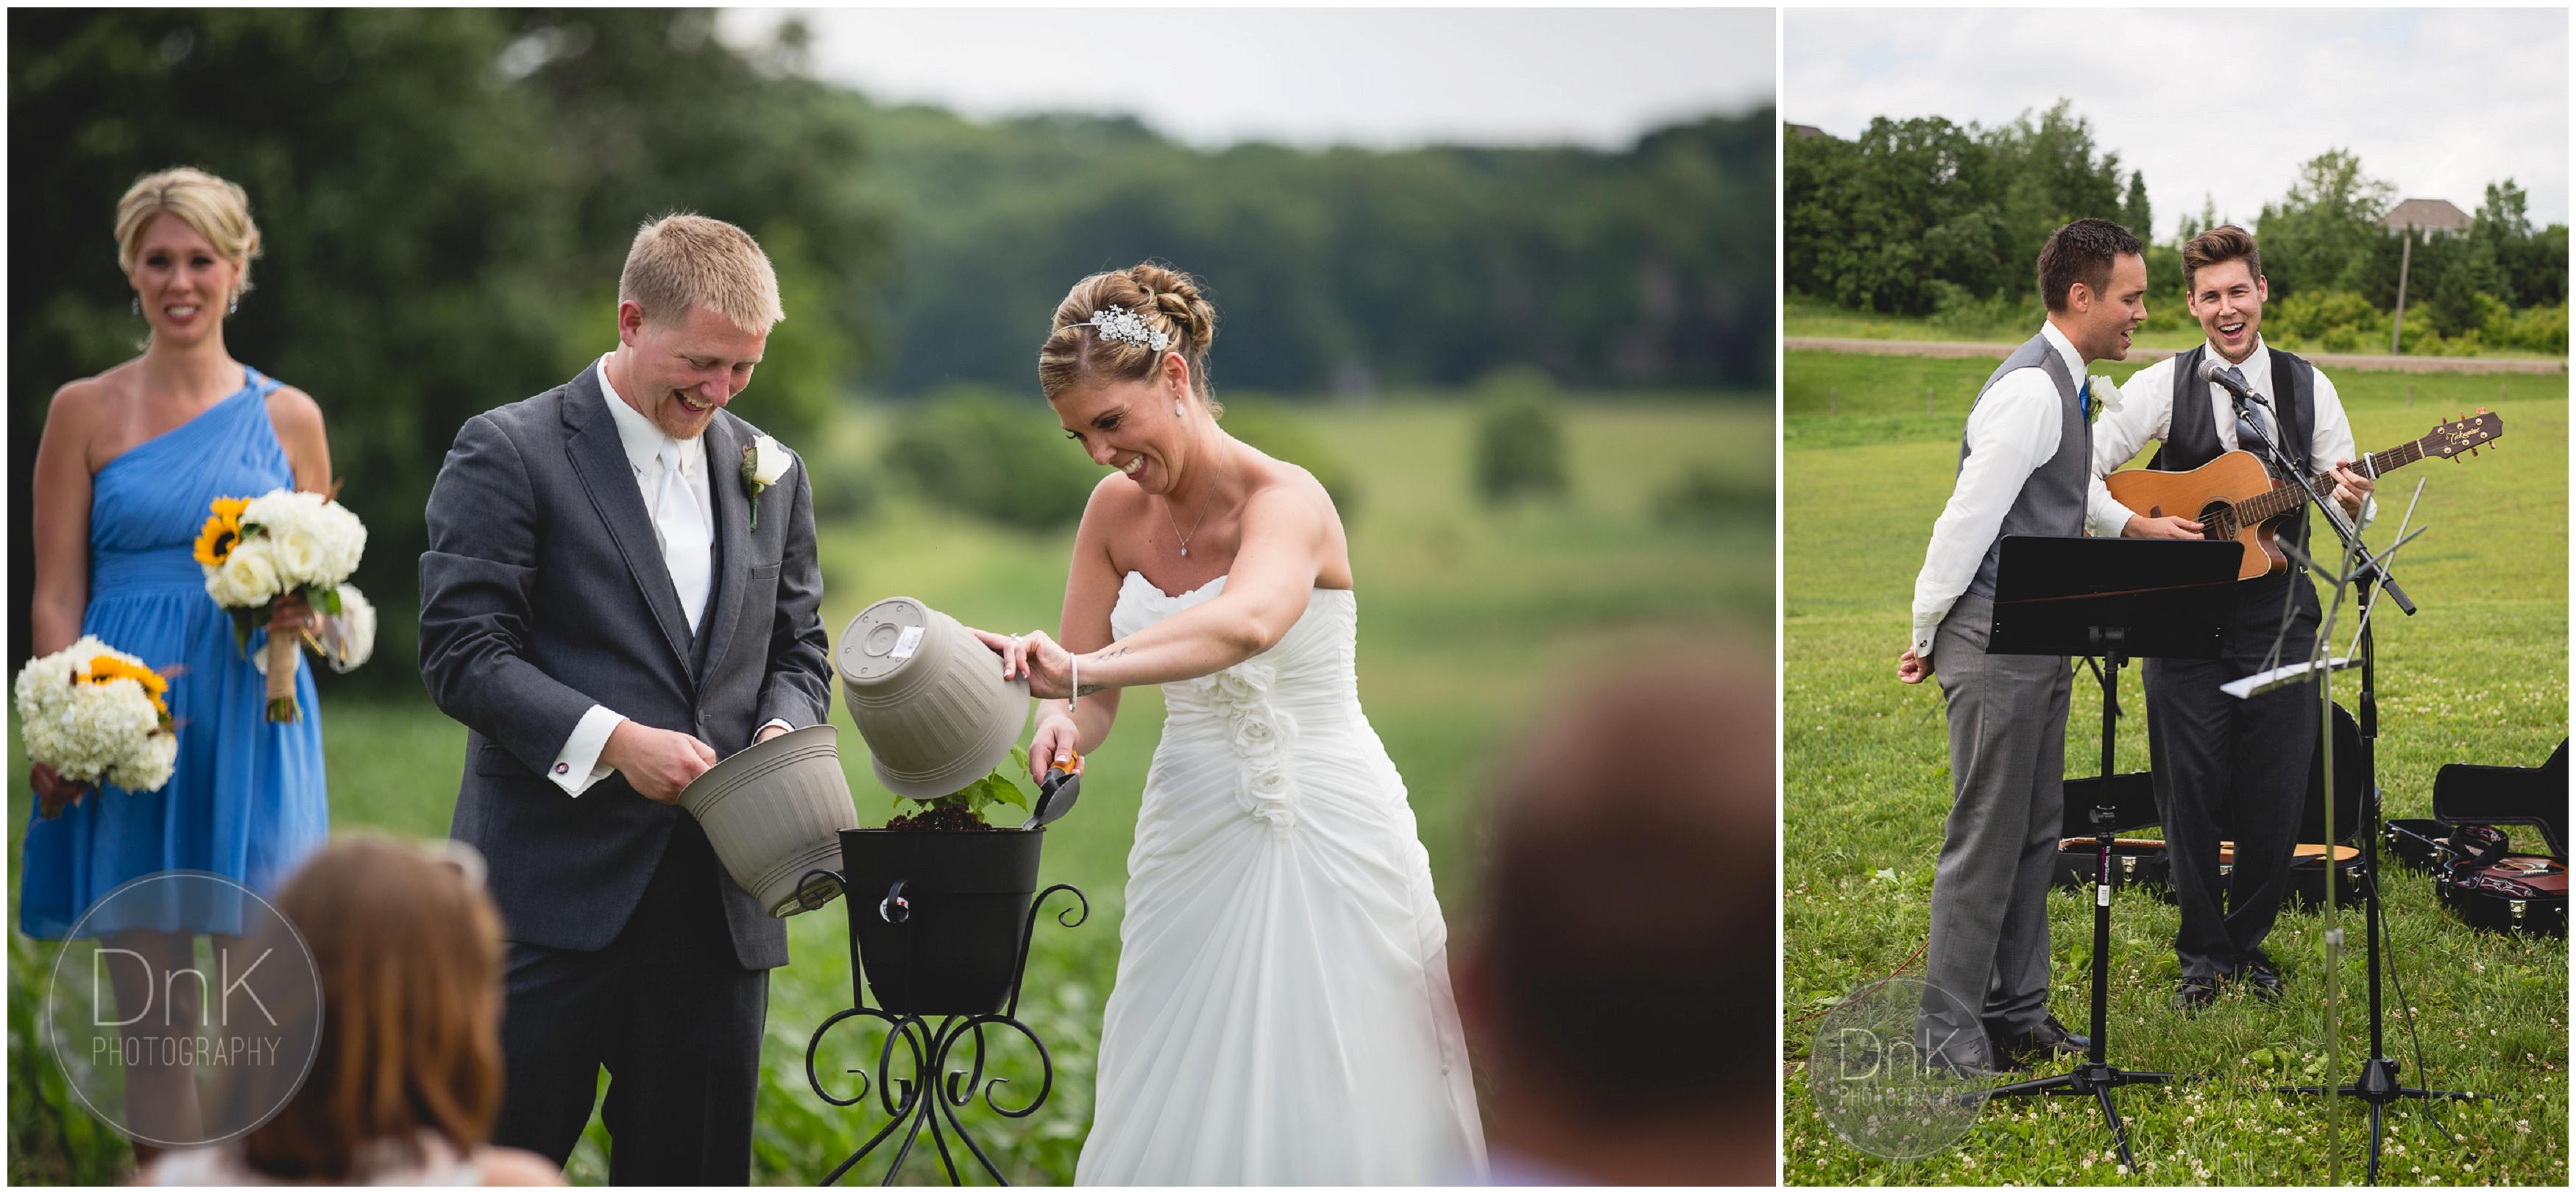 23- Outdoor Wedding Ceremony Dellwood Barn